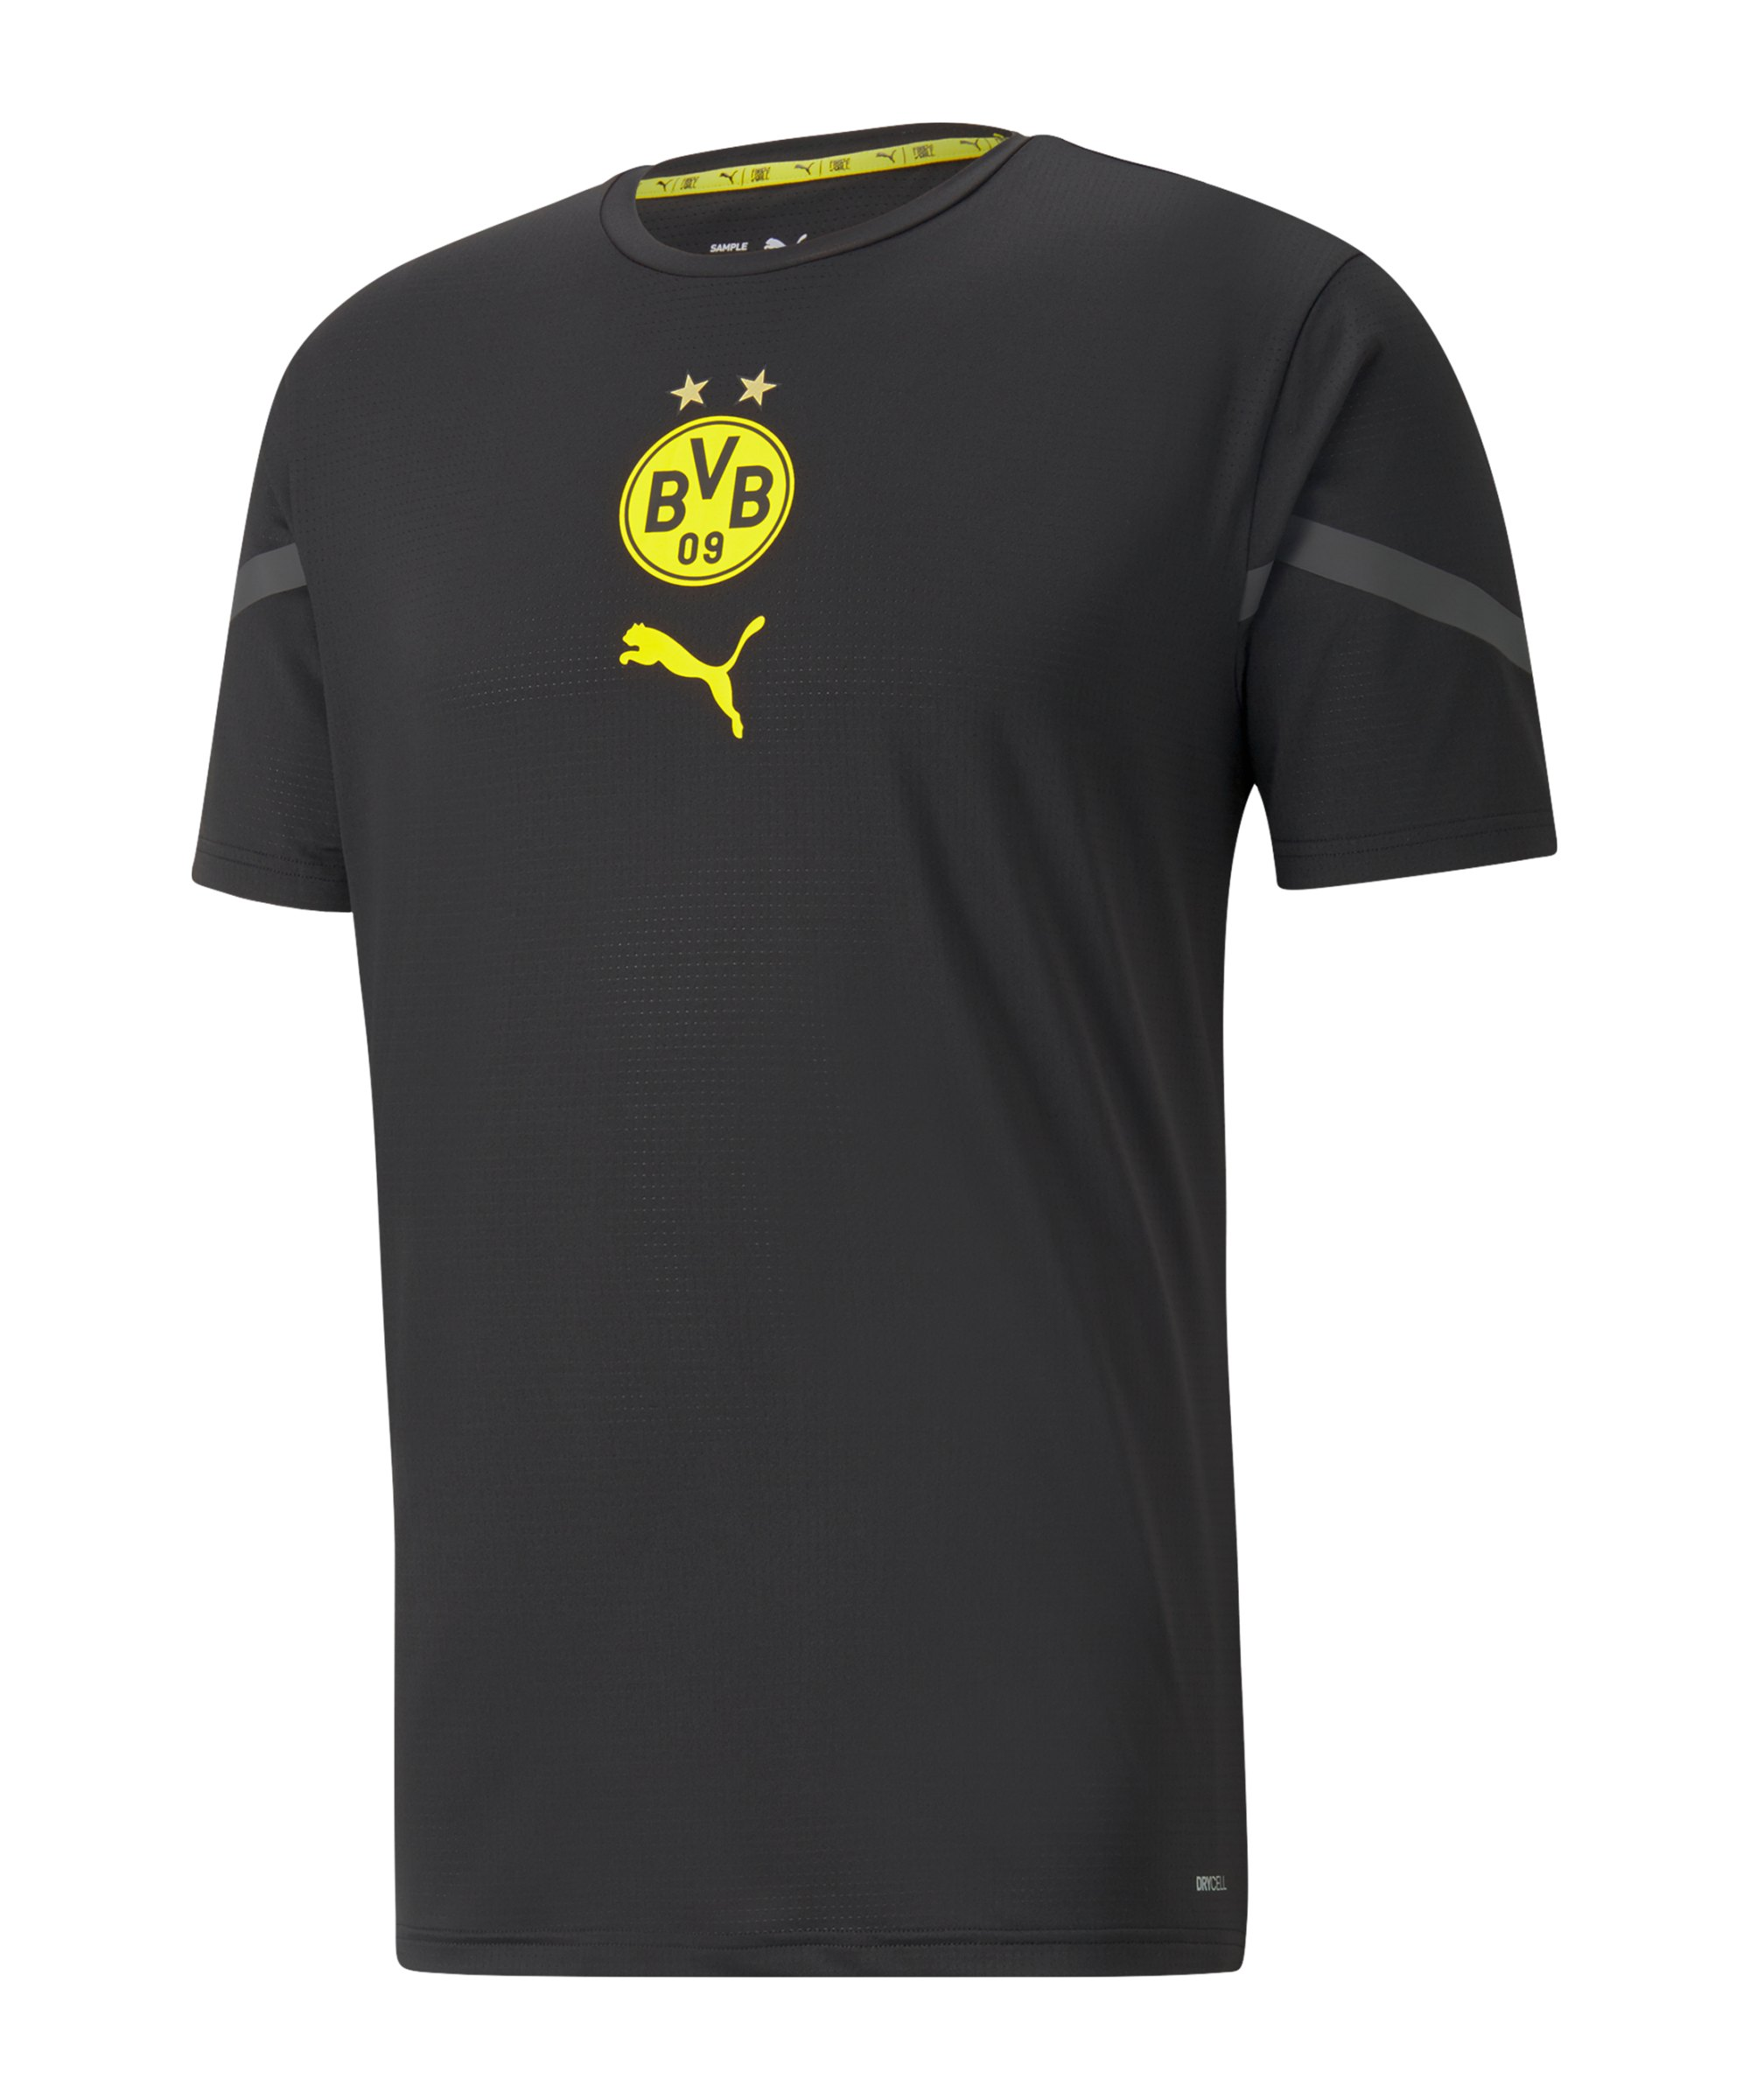 PUMA BVB Dortmund Prematch Shirt 2021/2022 Schwarz F02 - schwarz